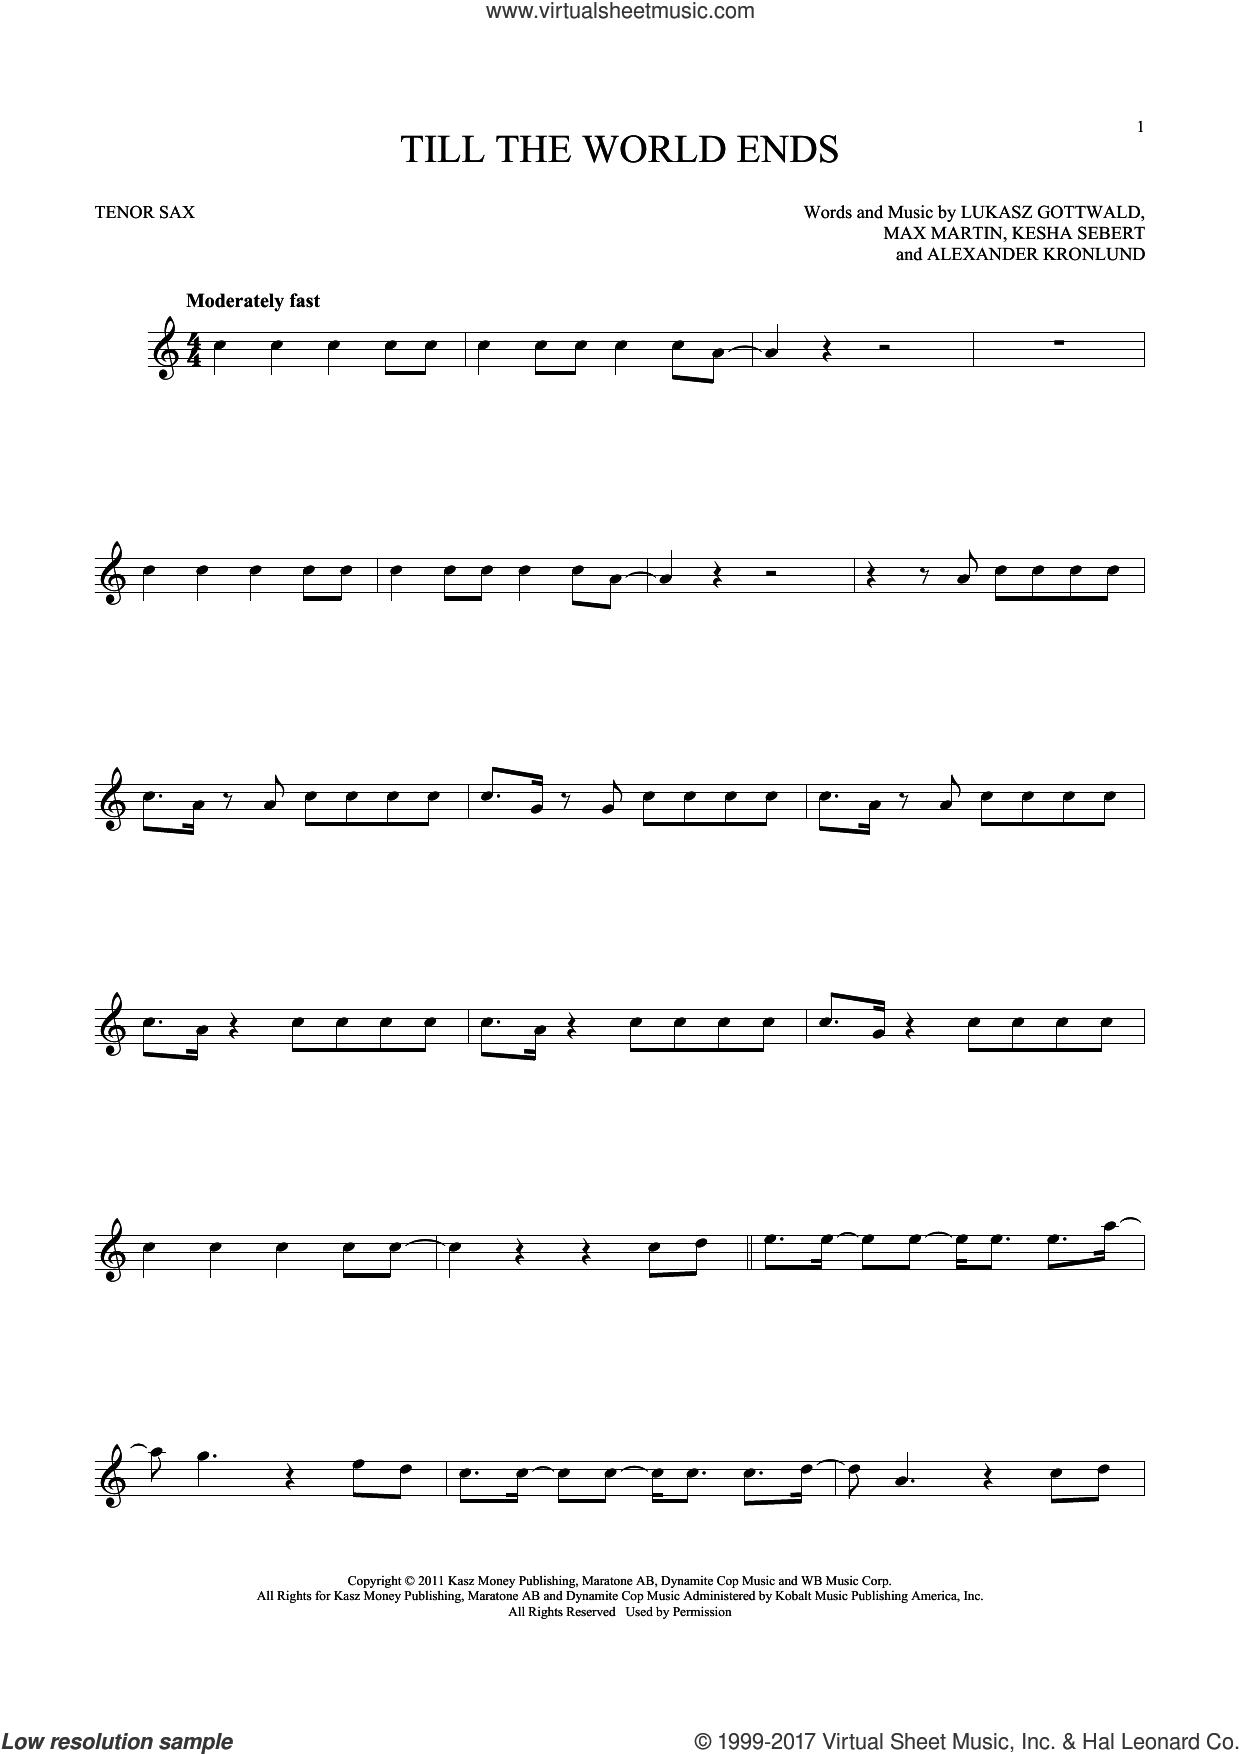 Till The World Ends sheet music for tenor saxophone solo by Britney Spears, Alexander Kronlund, Kesha Sebert, Lukasz Gottwald and Max Martin, intermediate skill level